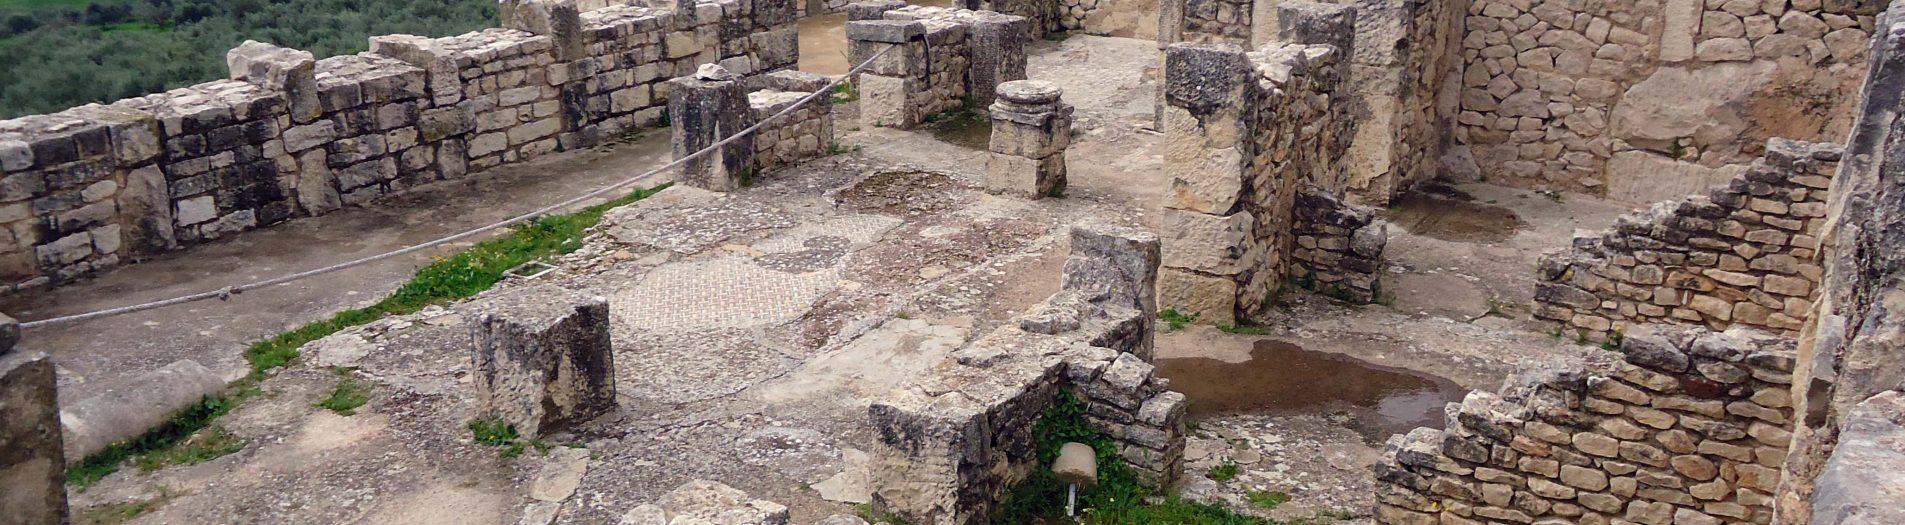 L'architecture domestique en Tunisie romaine